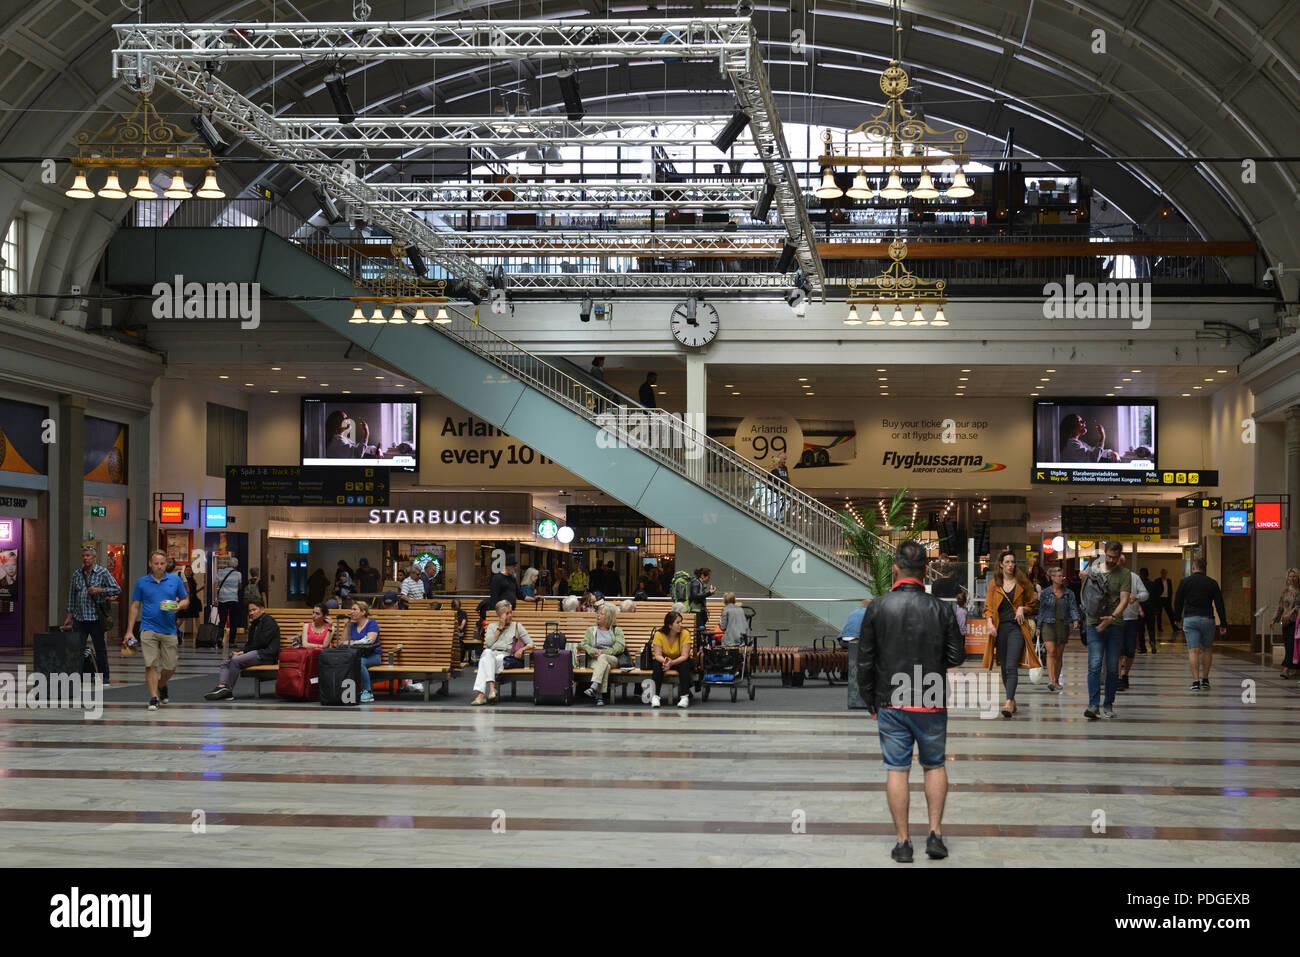 Stockholm Central Station, railway station. Interior - Stock Image